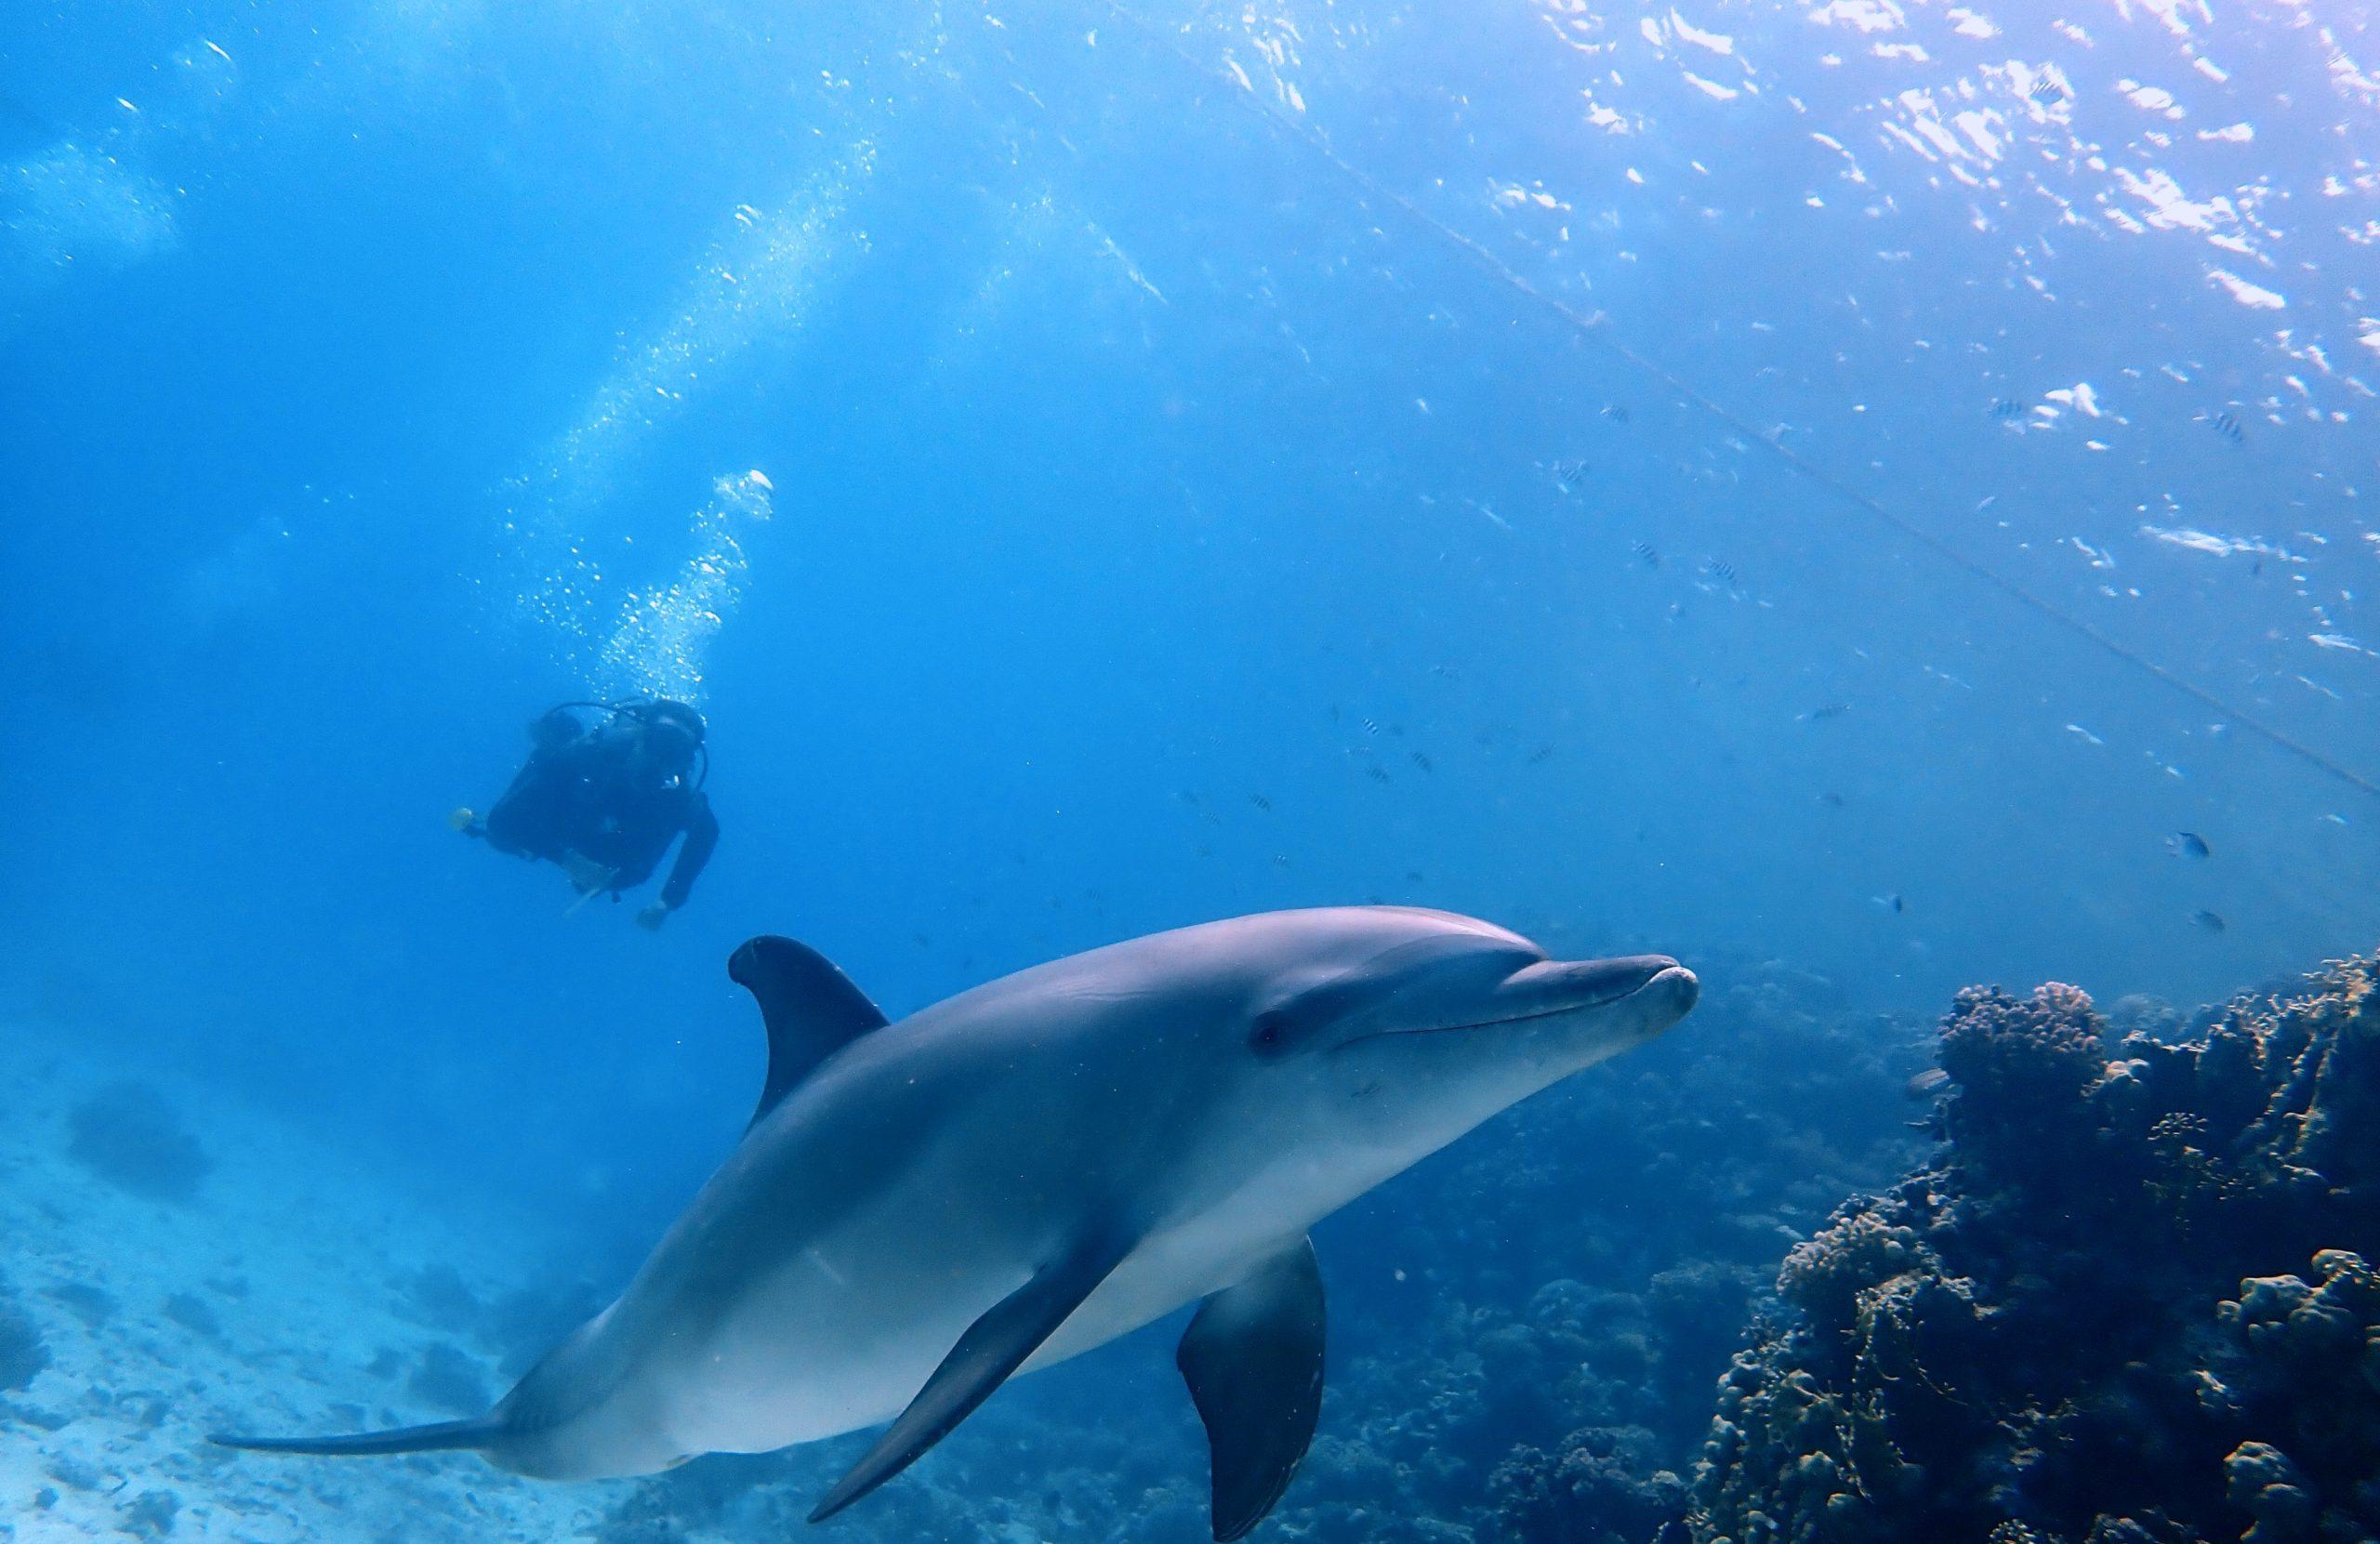 Seagate-Hurghada-Duiken-Scuba-Diving-Padi-Duikcursus-Divingcourse-Prijzen-Prices